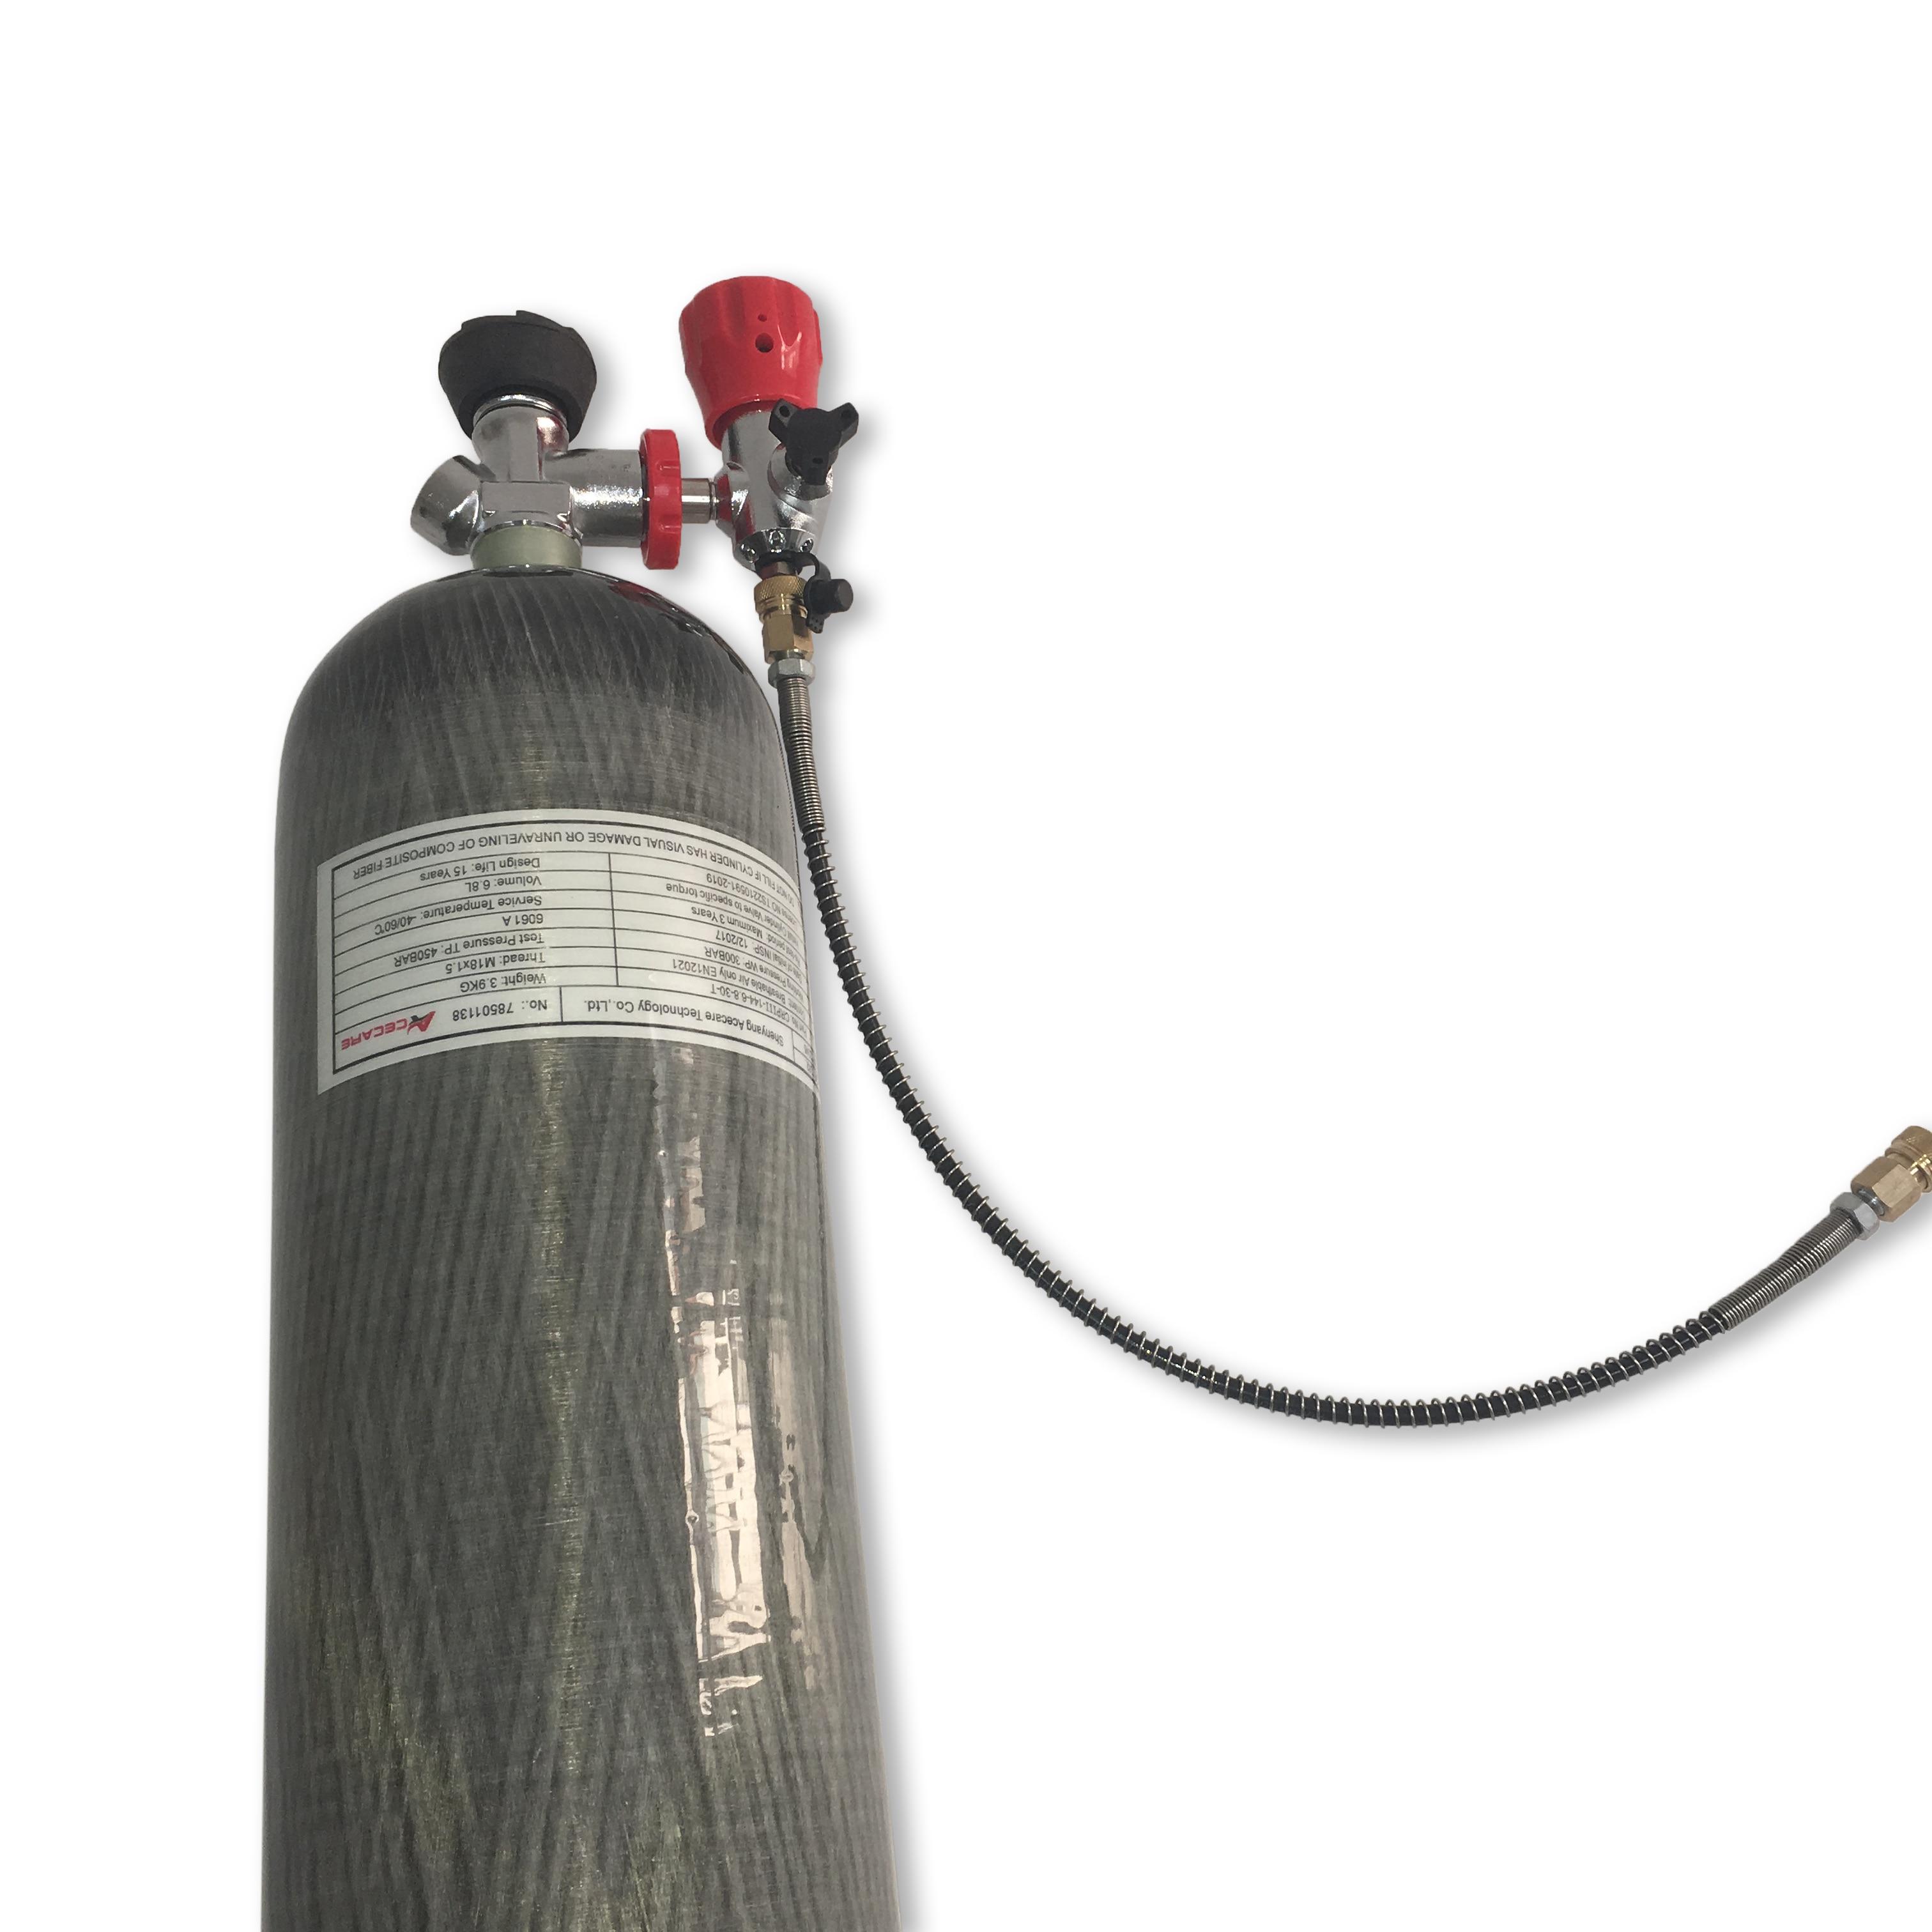 ACECARE 6.8L CE Compressed Air Scuba Condor Pcp Paintball Air Tank/carbon Tank Compressed Air 4500psi/300bar/30mpa AC168301